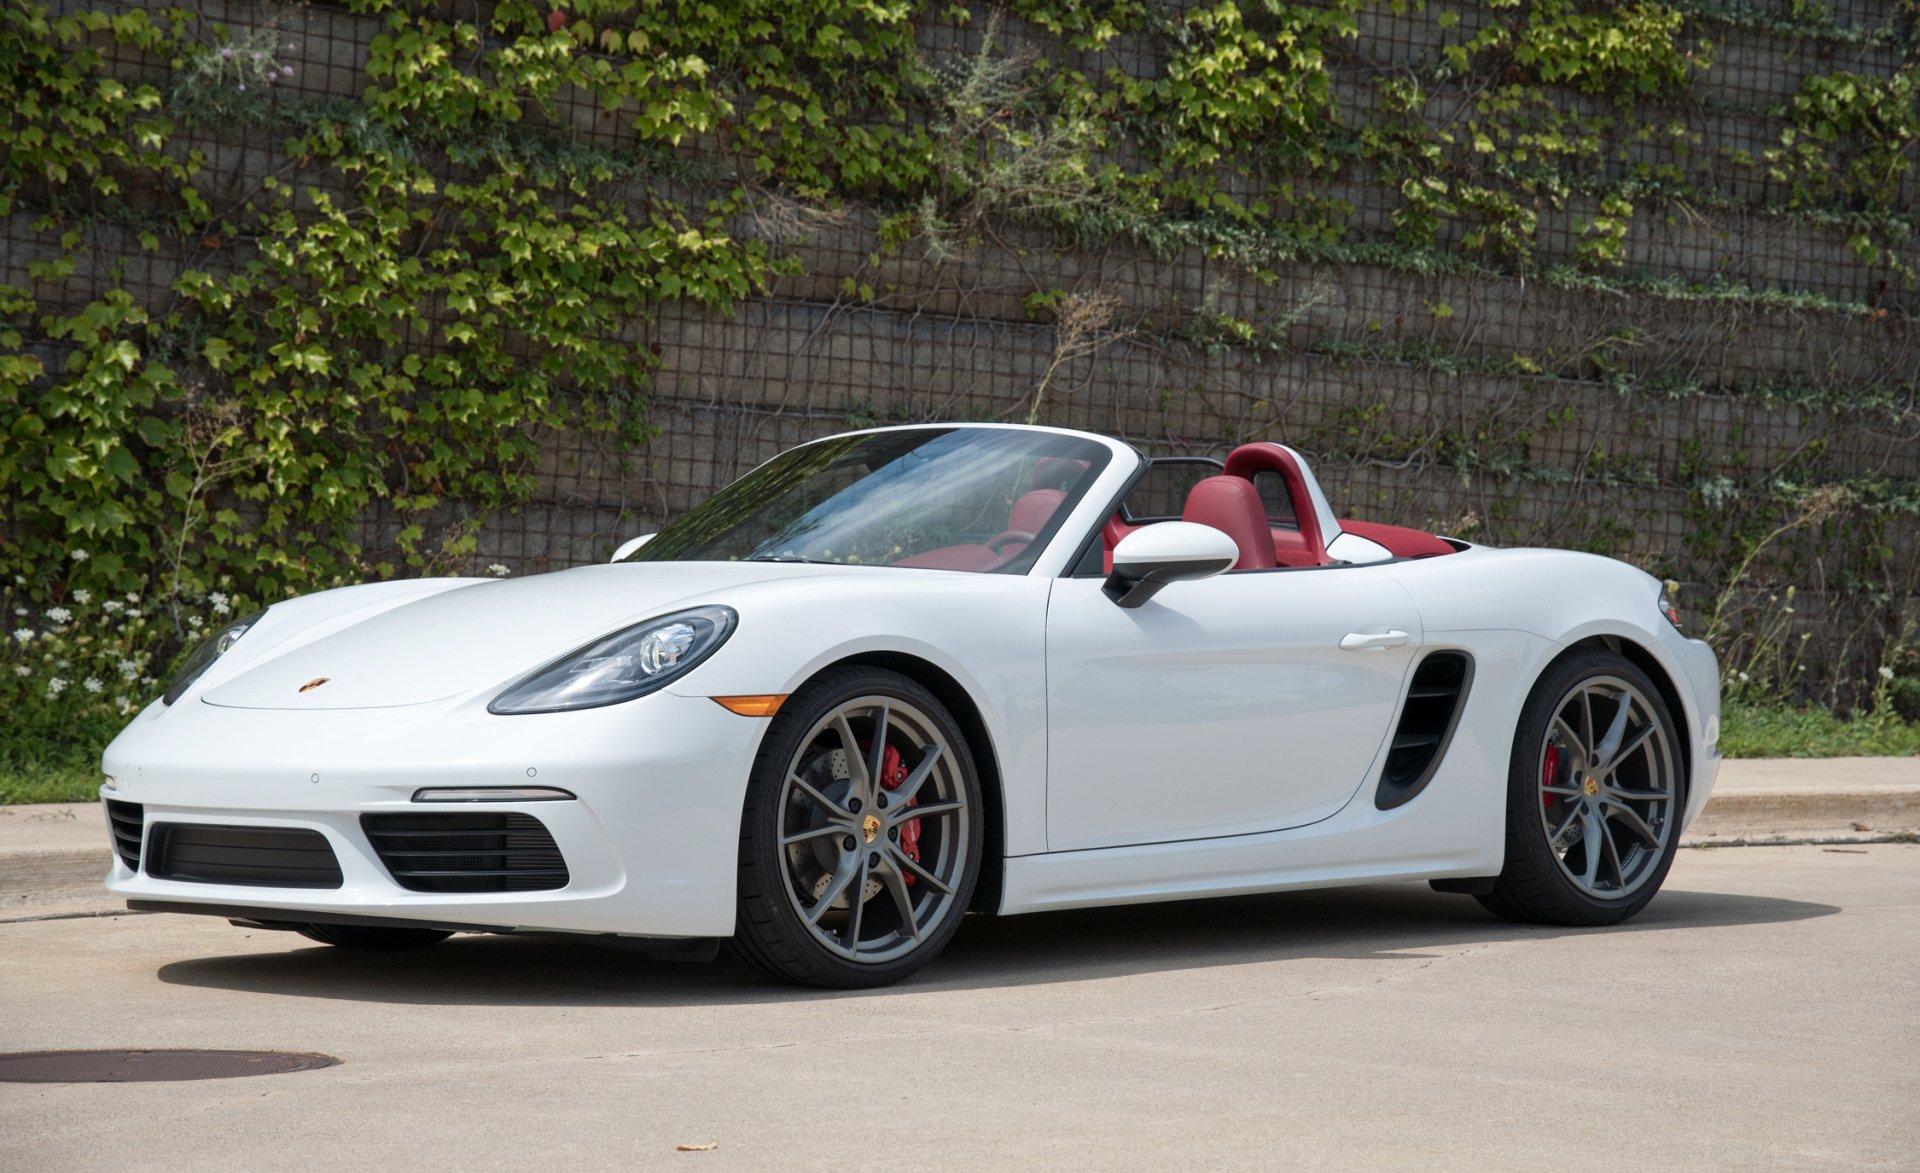 Vehicles - Porsche 911  Porsche Car Vehicle White Car Sport Car Convertible Wallpaper